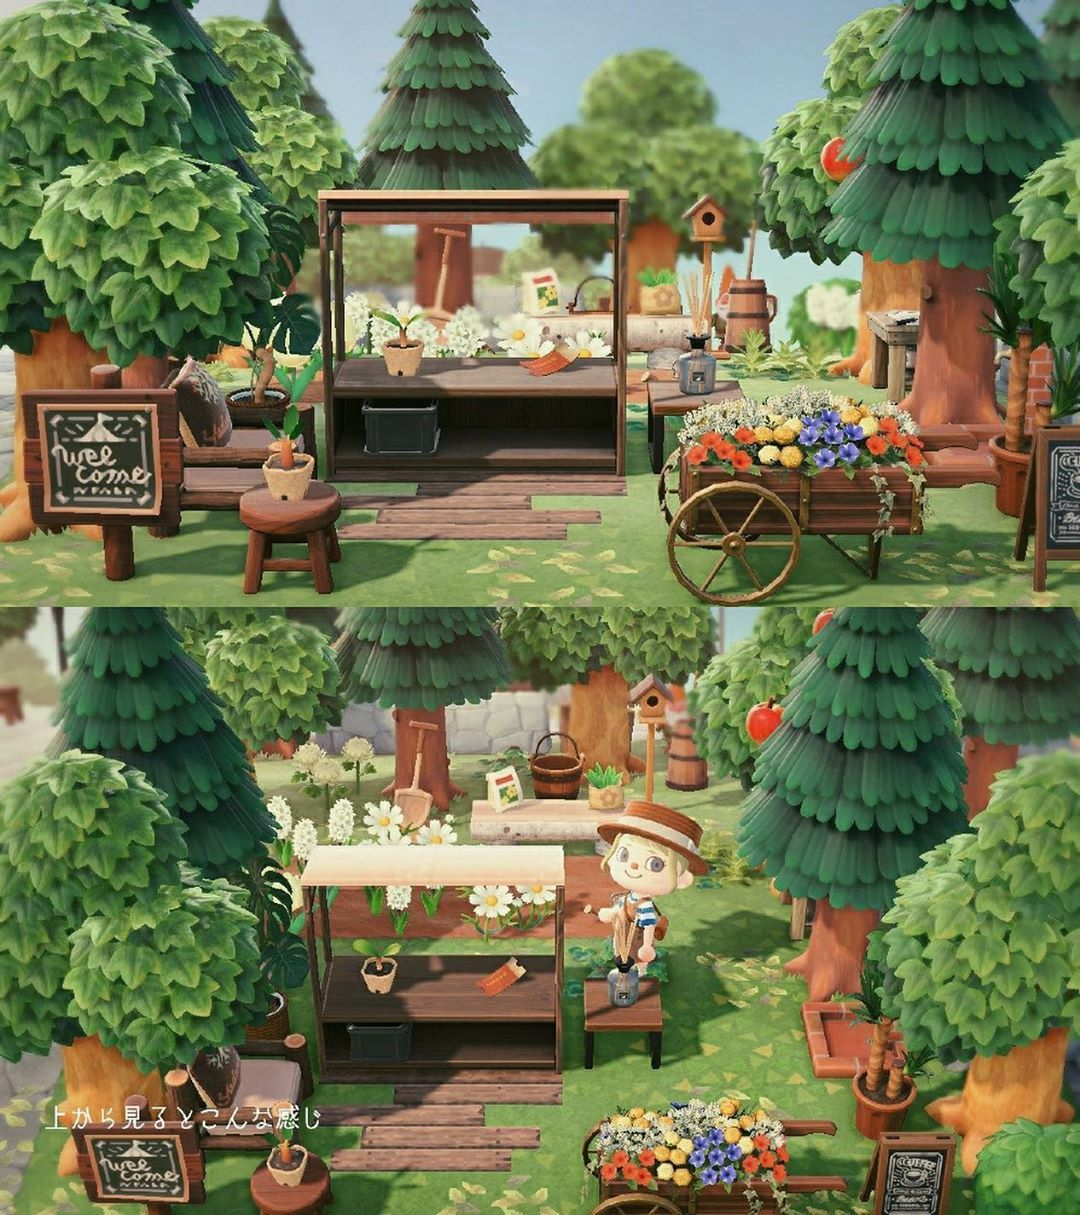 Animal Crossing Store On Instagram Flower Shop Twitter Hiiragi Ac11 Animalcro In 2020 Animal Crossing Animal Crossing Wild World Animal Crossing Guide